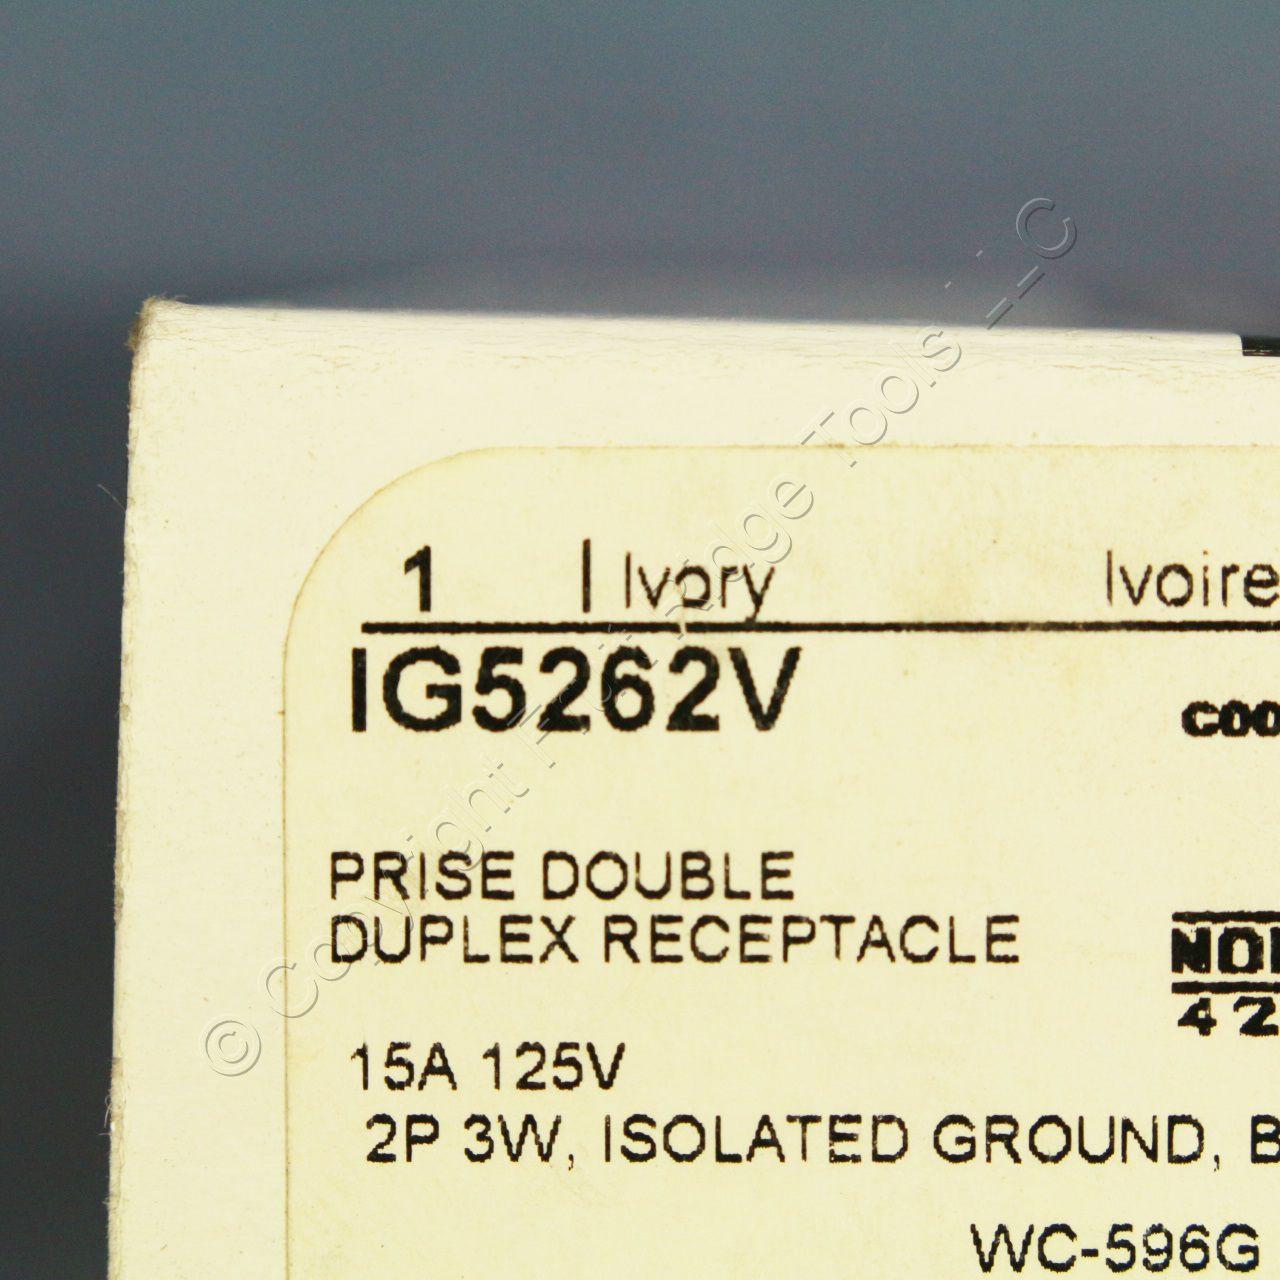 cooper white isolated ground surge suppressor receptacle isolated ground wiring shop new cooper ivory isolated ground receptacle duplex [ 1280 x 1280 Pixel ]